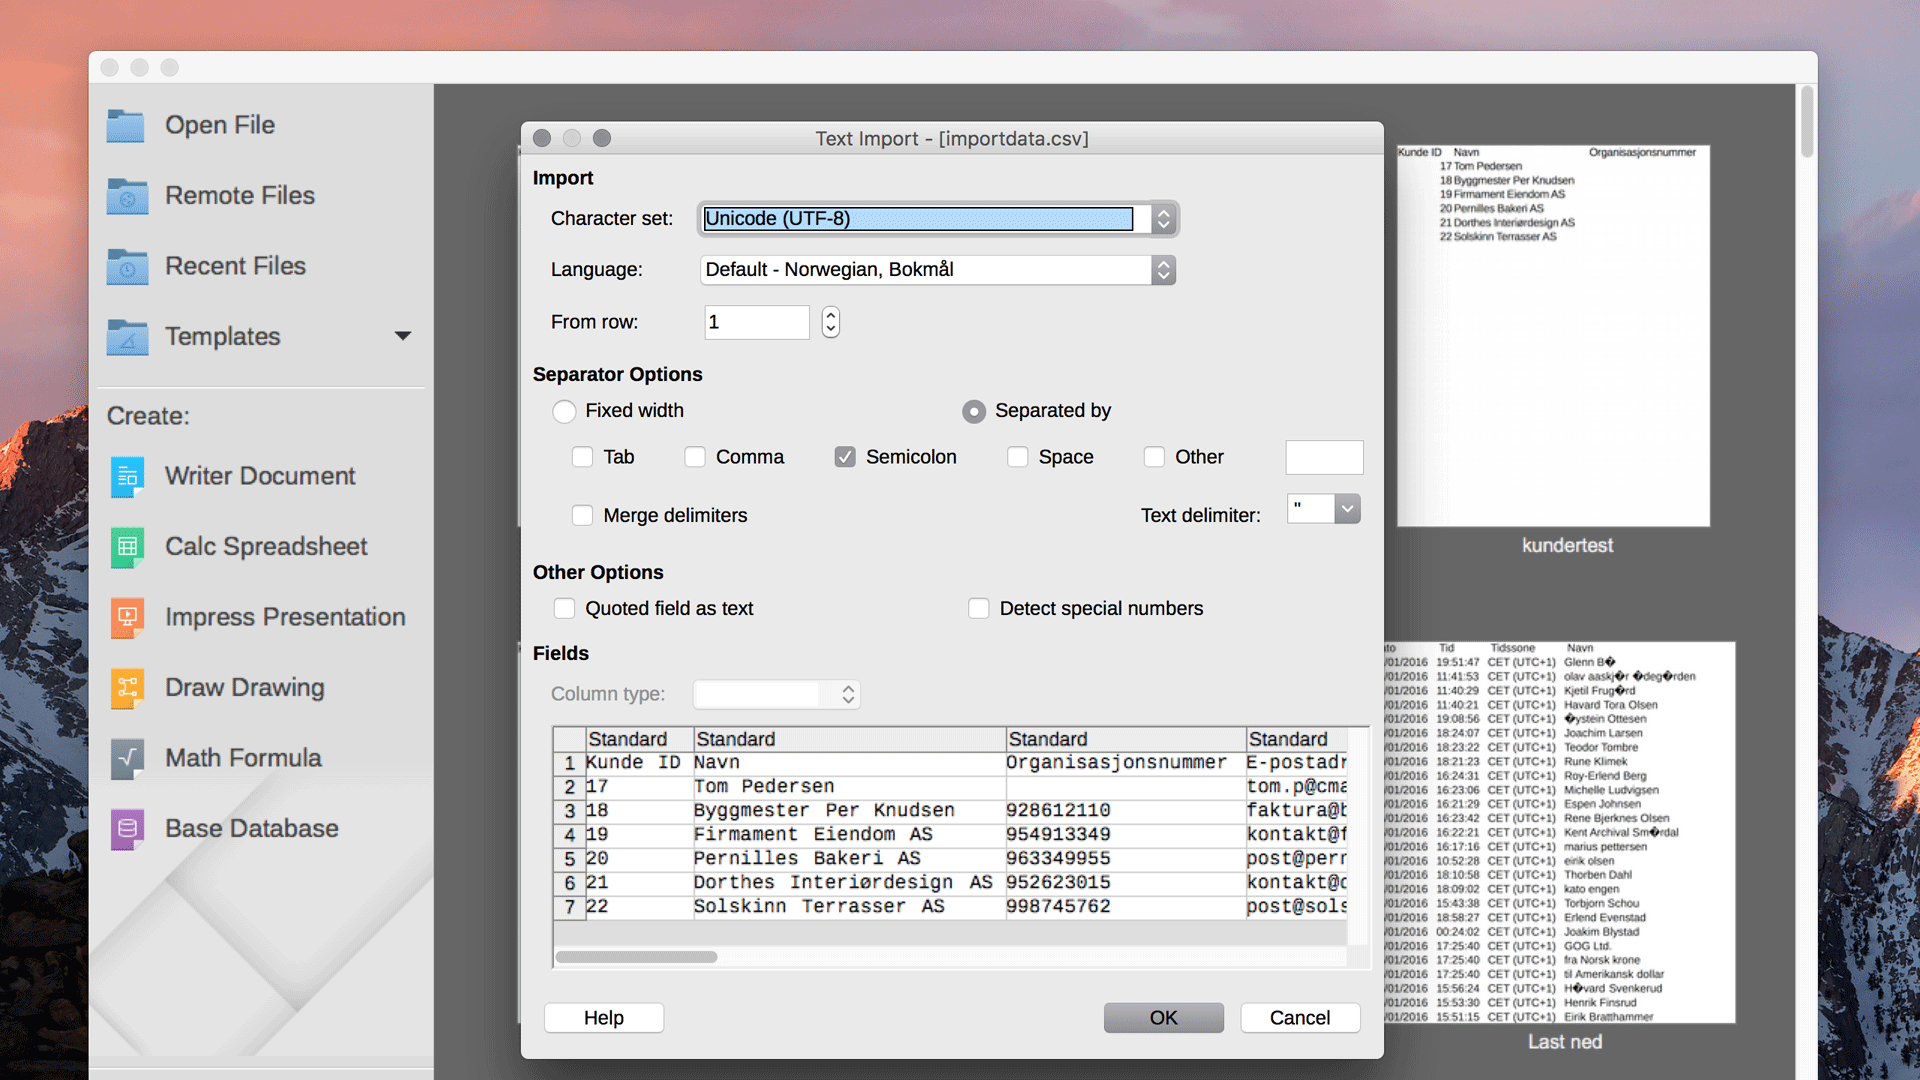 LibreOffice-illustrasjon